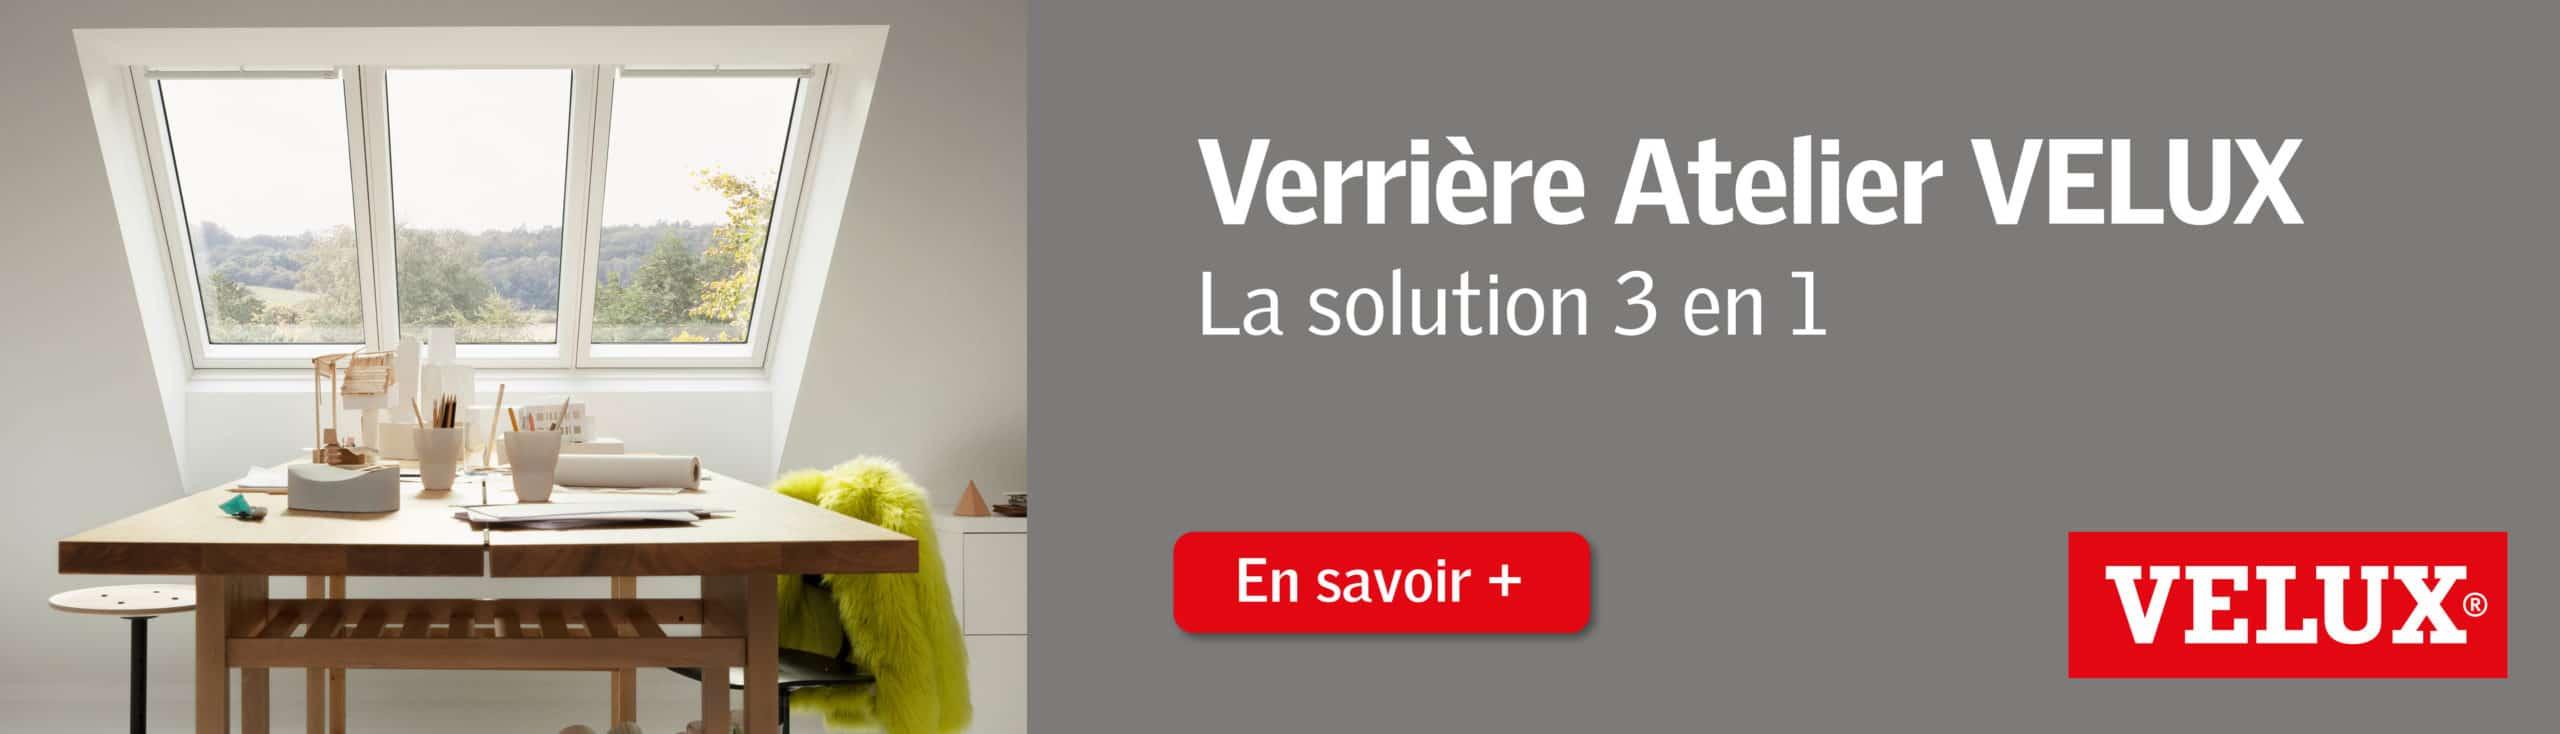 Banniere-VELUX-Atelier-part